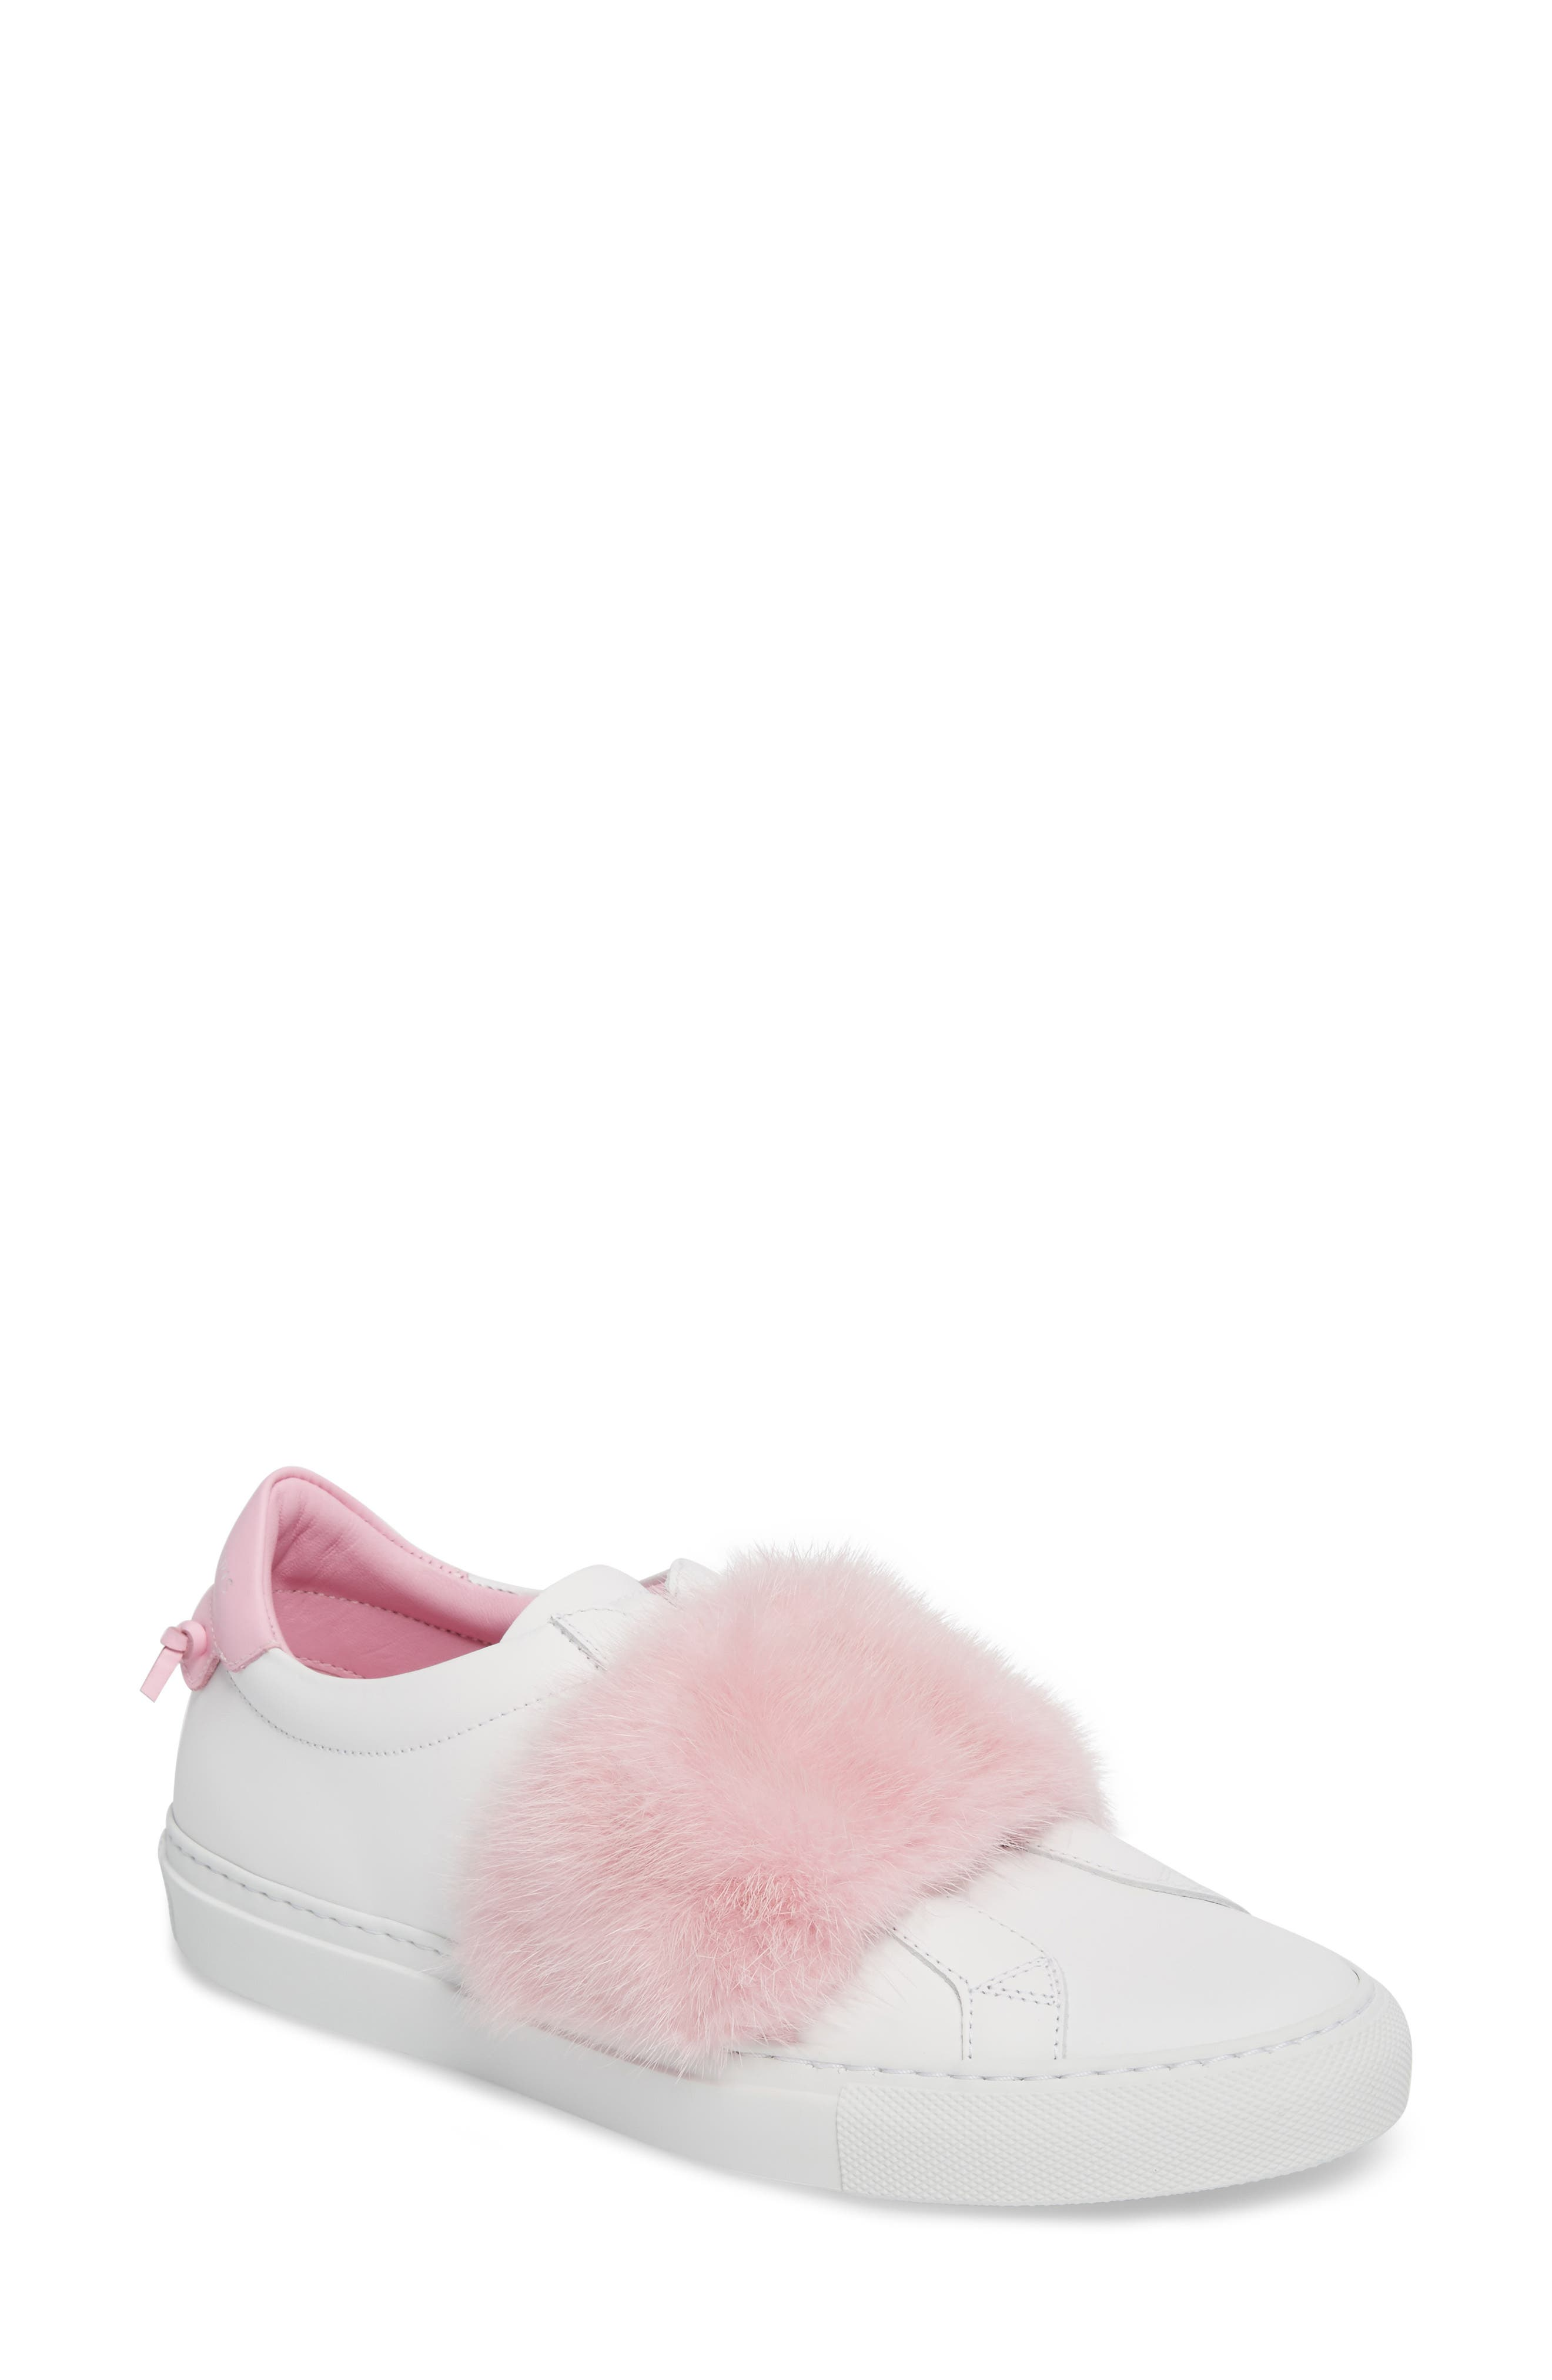 Urban Street Slip-On Sneaker with Genuine Mink Fur Trim,                             Main thumbnail 1, color,                             White/ Pink